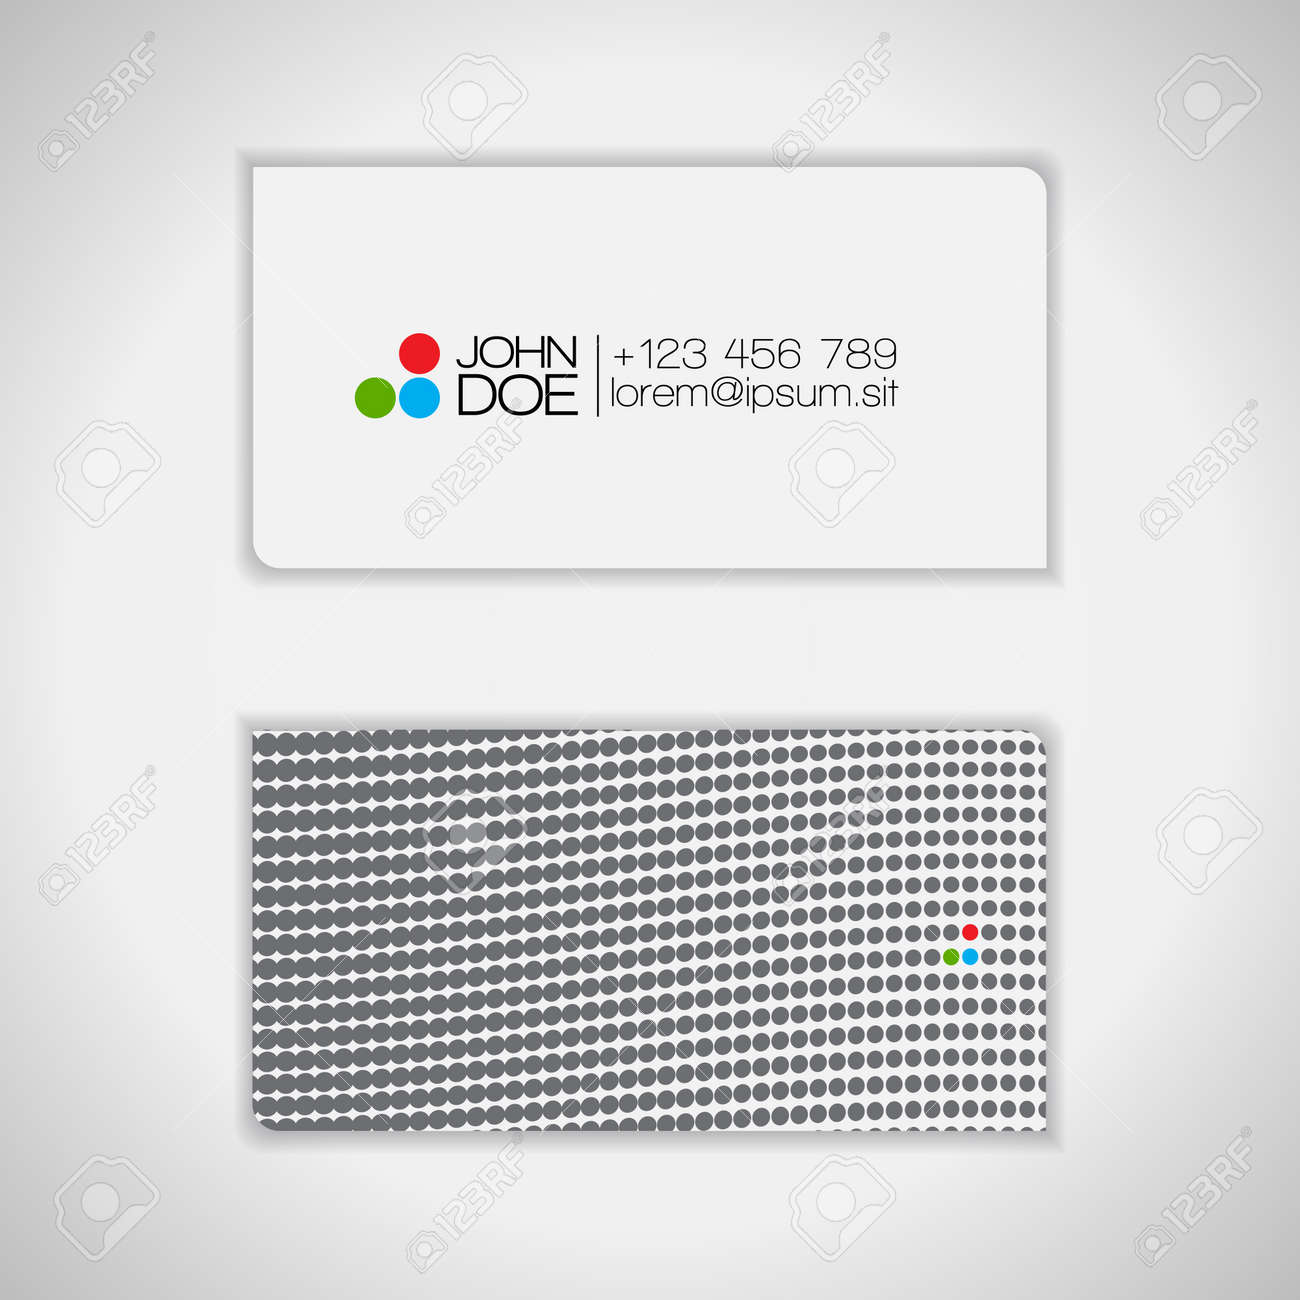 Dots Design Business Card Stock Vector - 14425229